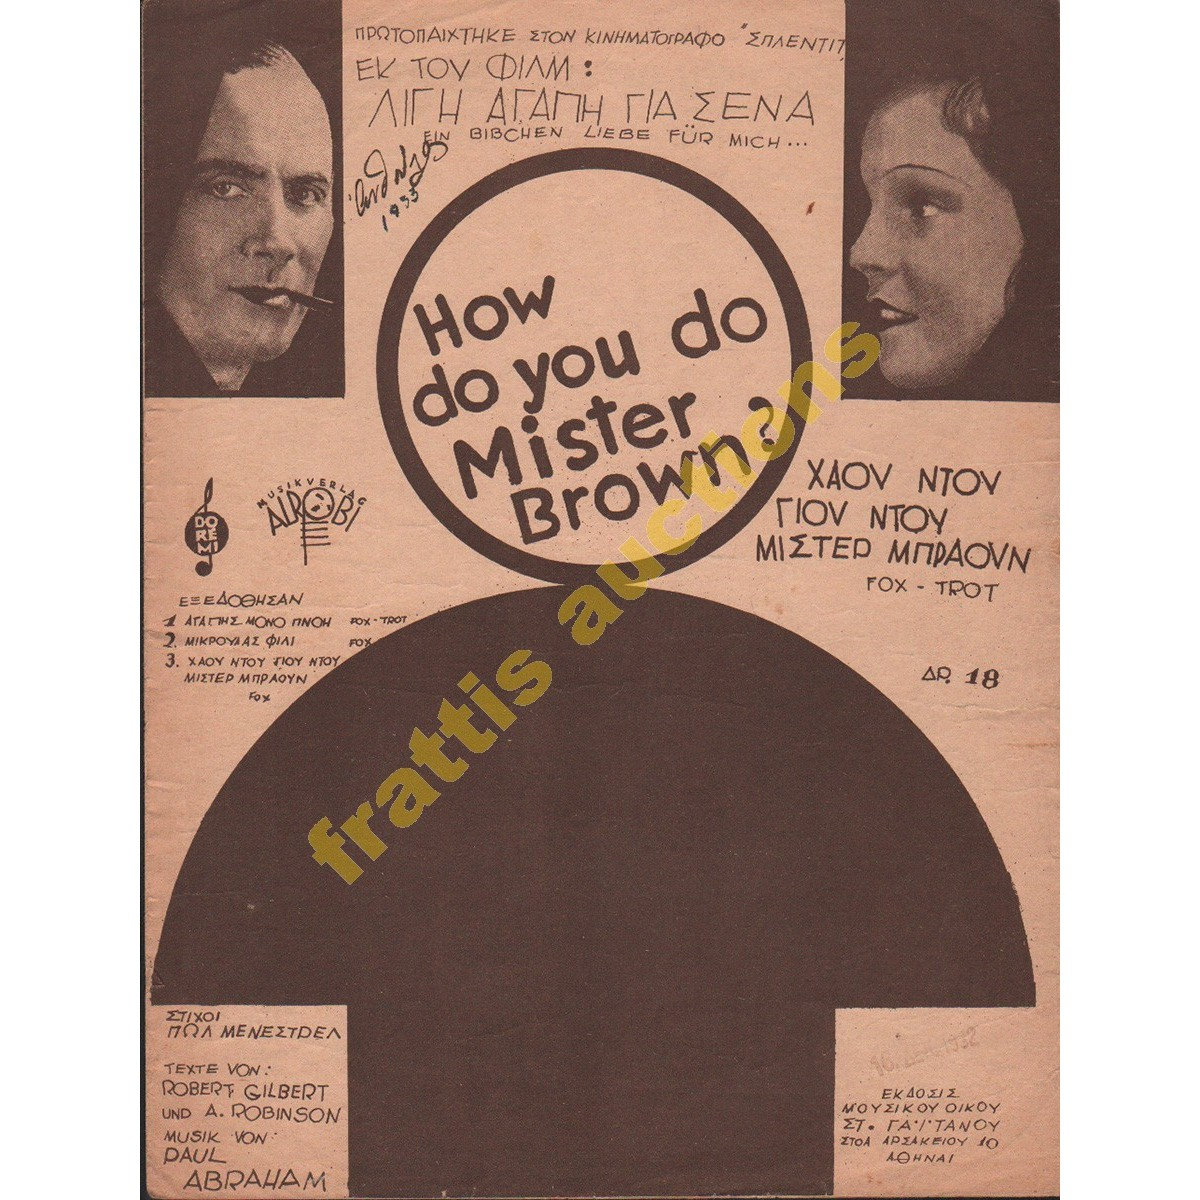 How do you do mister Brown?